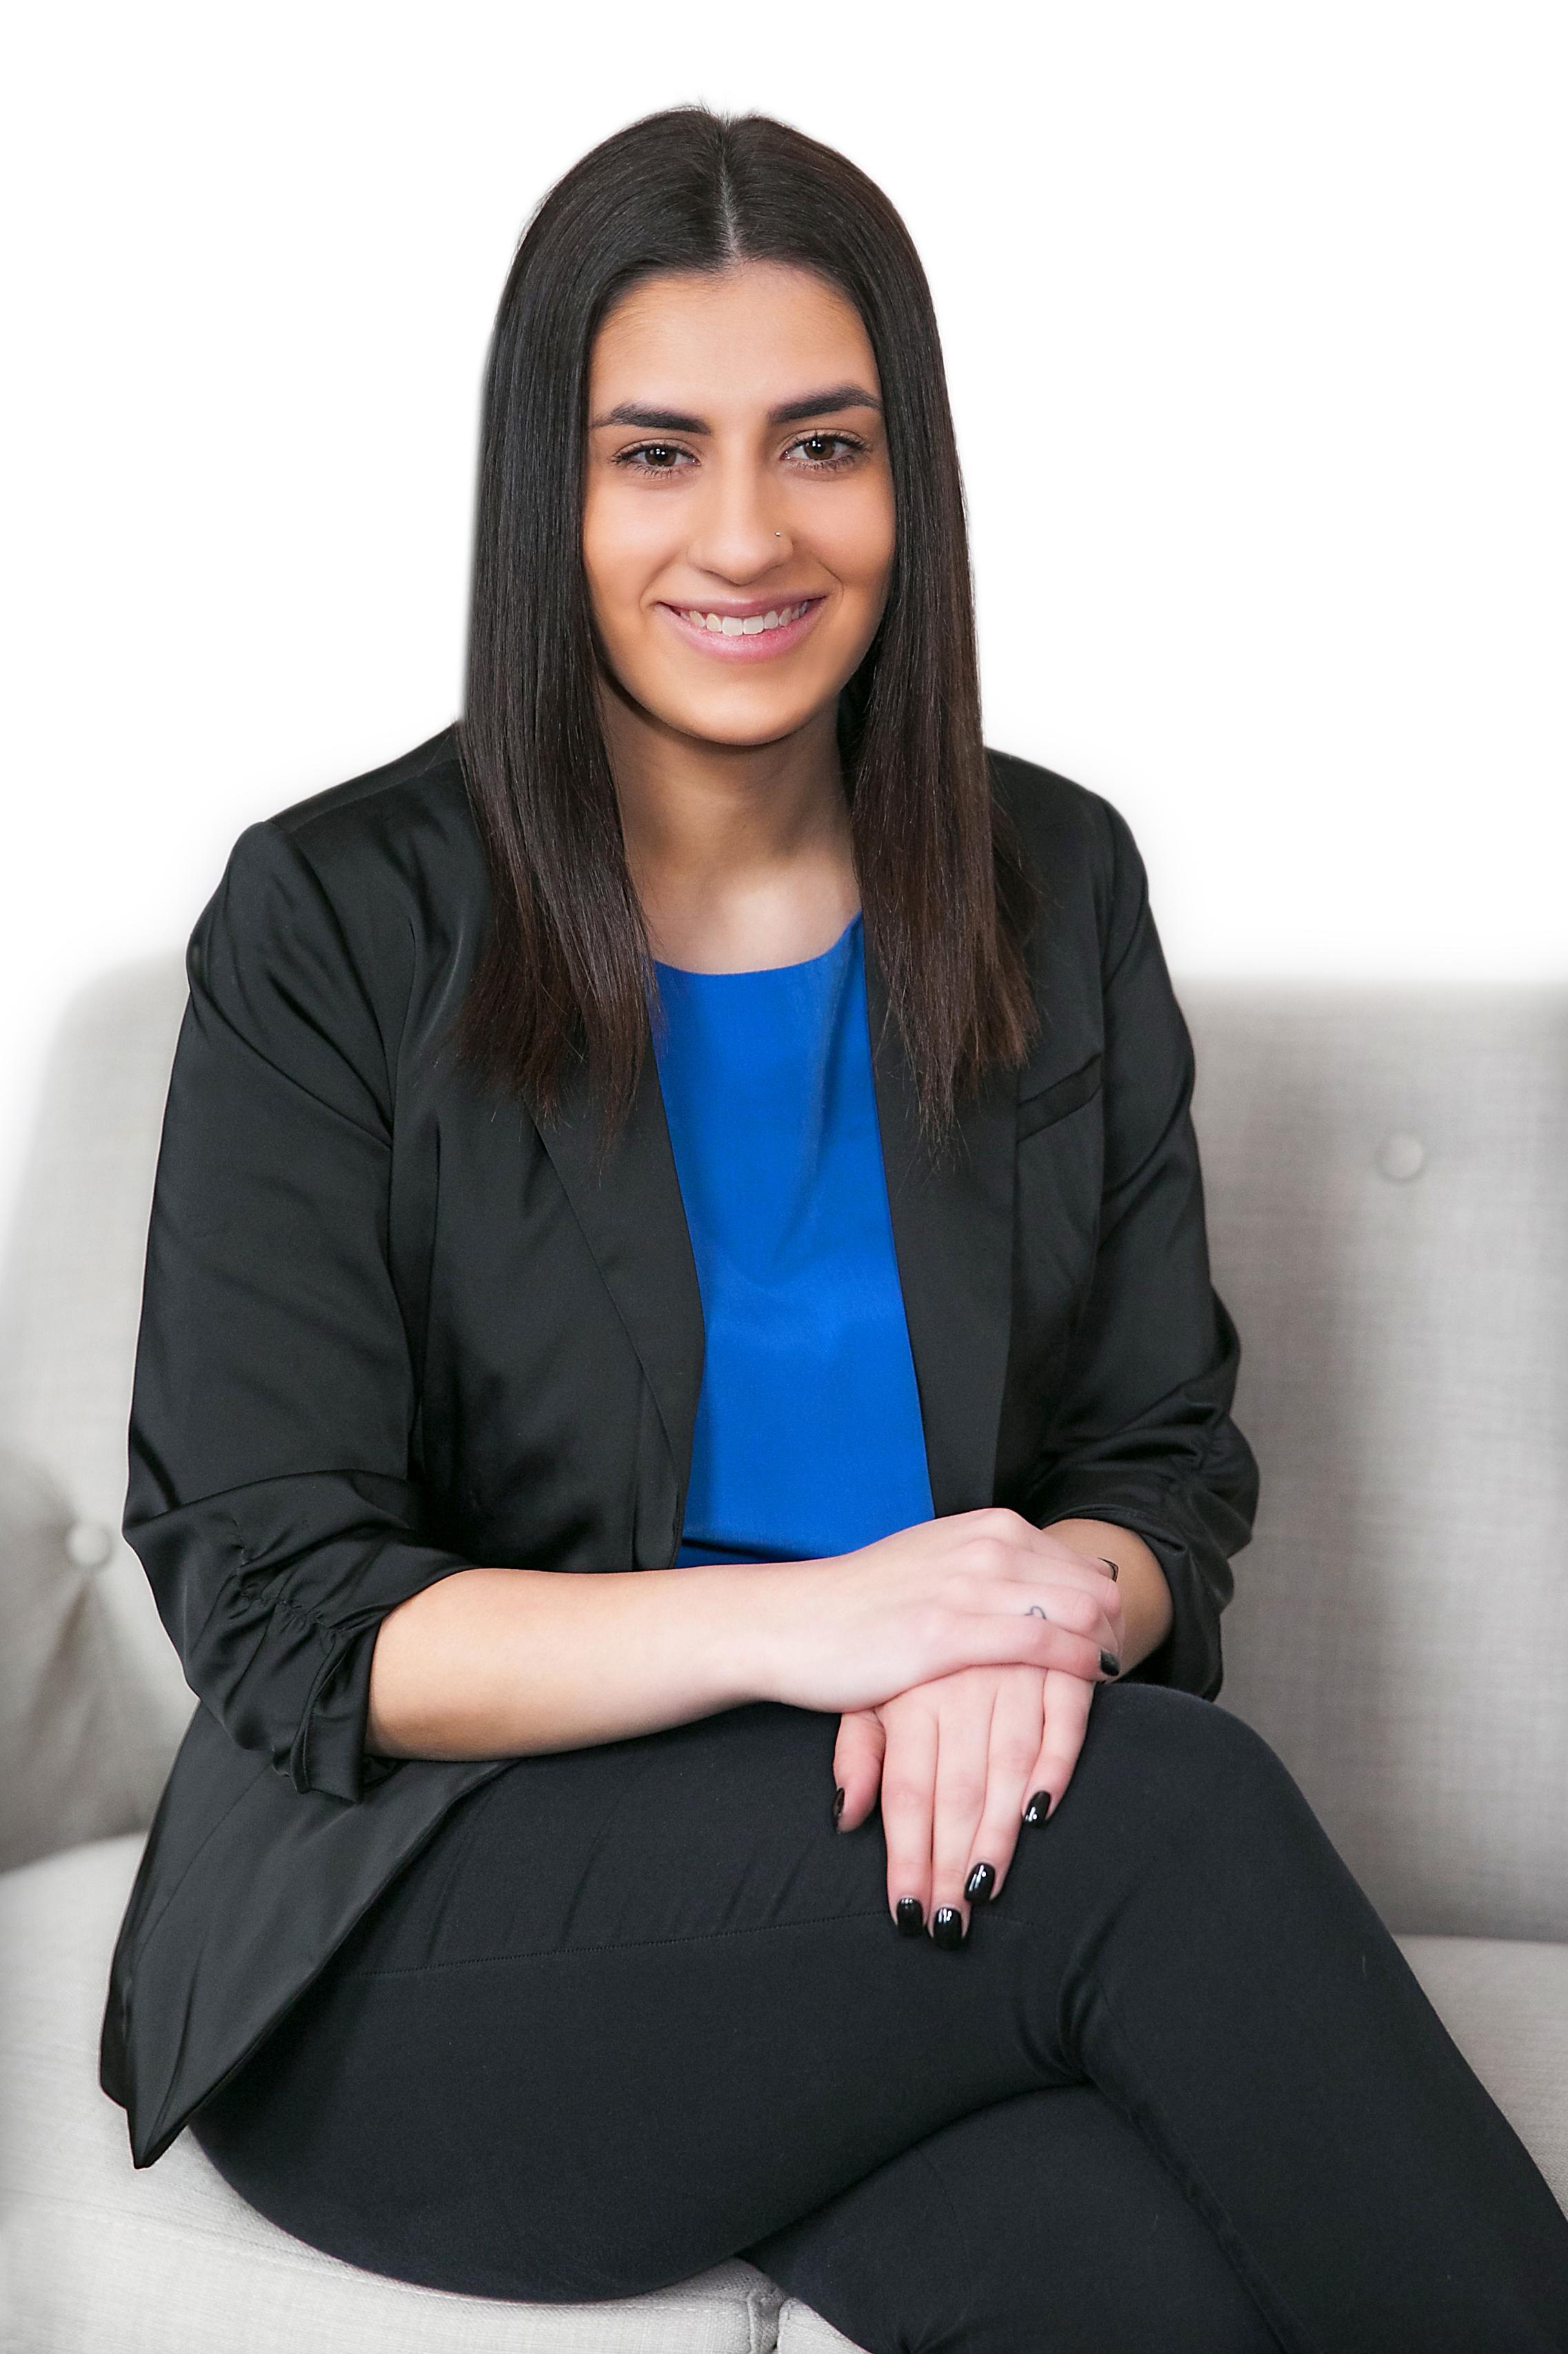 Joanne Schembri